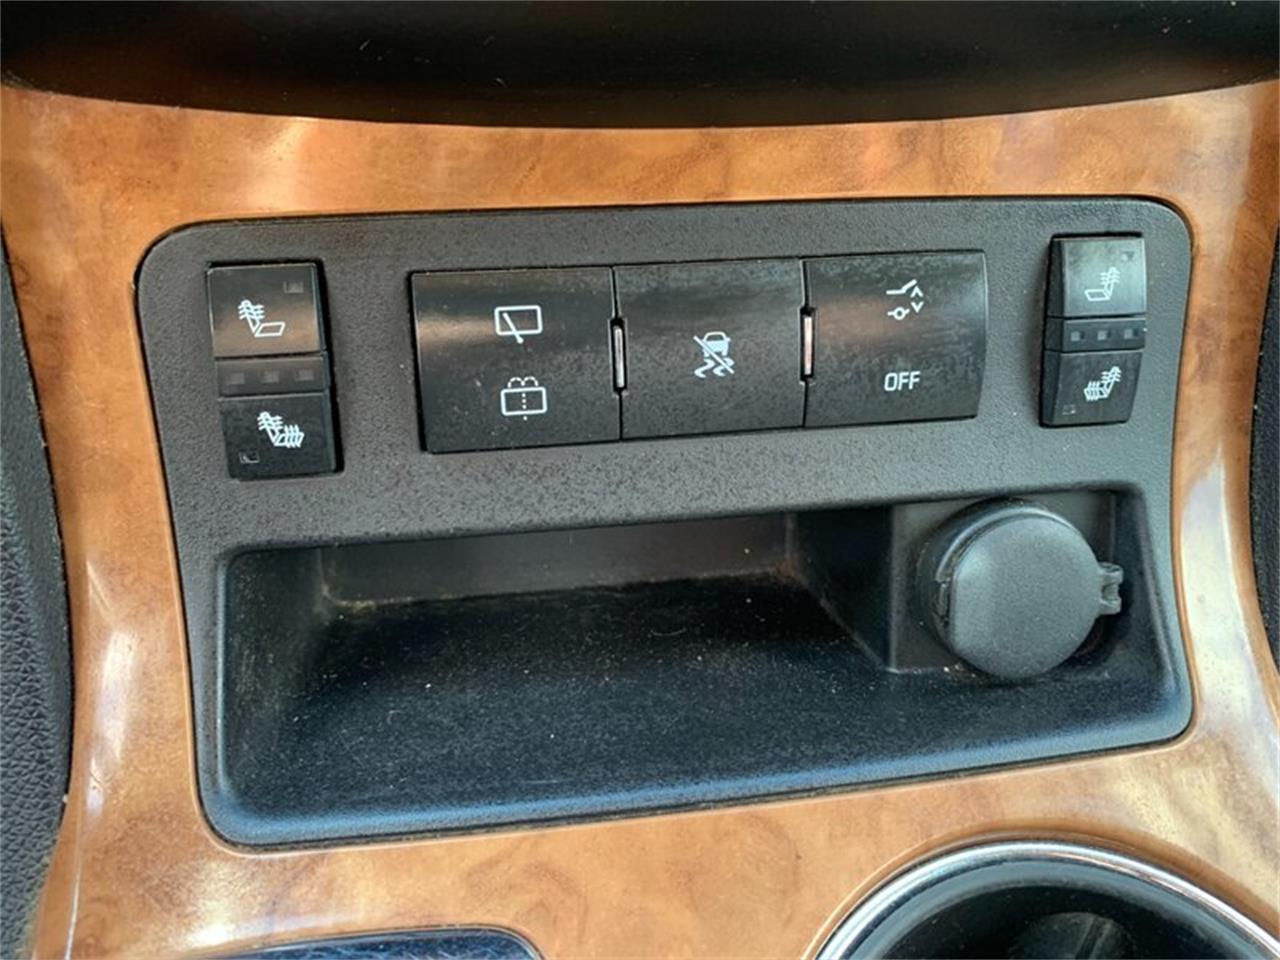 2008 Buick Enclave (CC-1411022) for sale in Bismarck, North Dakota